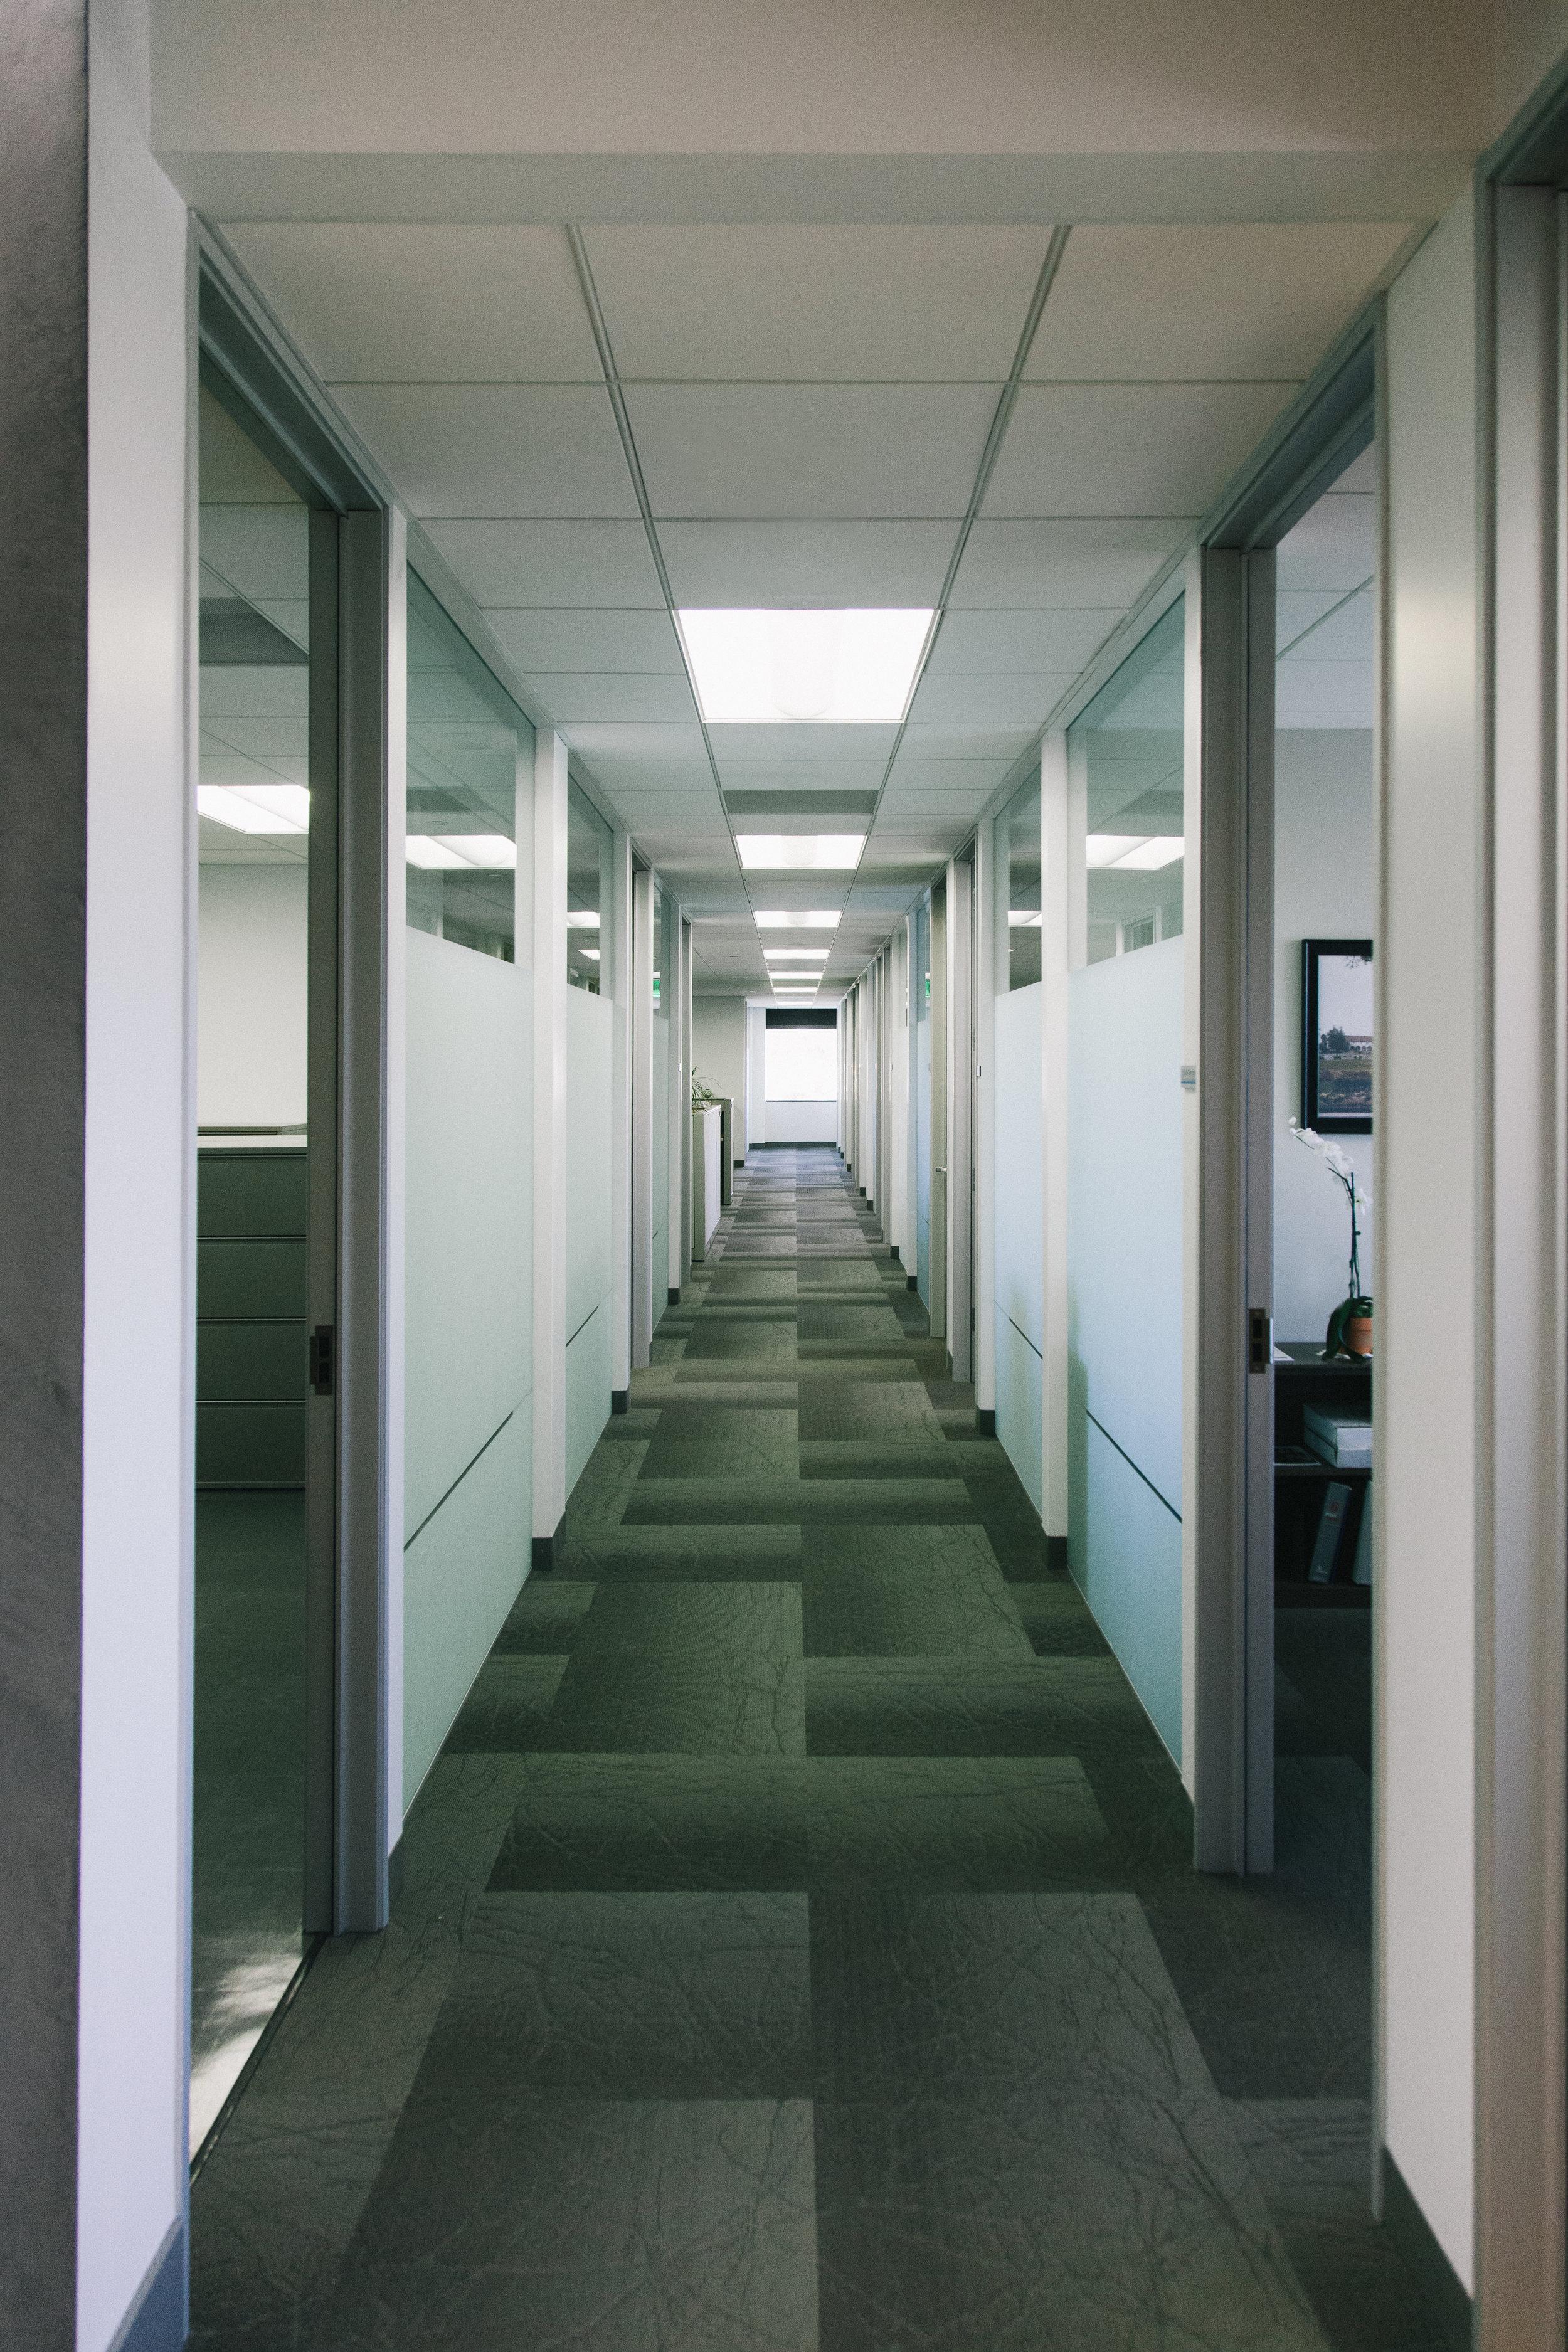 S.E.A.-Studio-Environmental-Architecture-David-Hertz-FAIA-First-Pacific-Advisors-Los-Angeles-tenant-improvement-sustainable-regenerative-restorative-green-design-office-sleek-modern-interior-Westside-commercial-building-professional-workplace-8.jpg